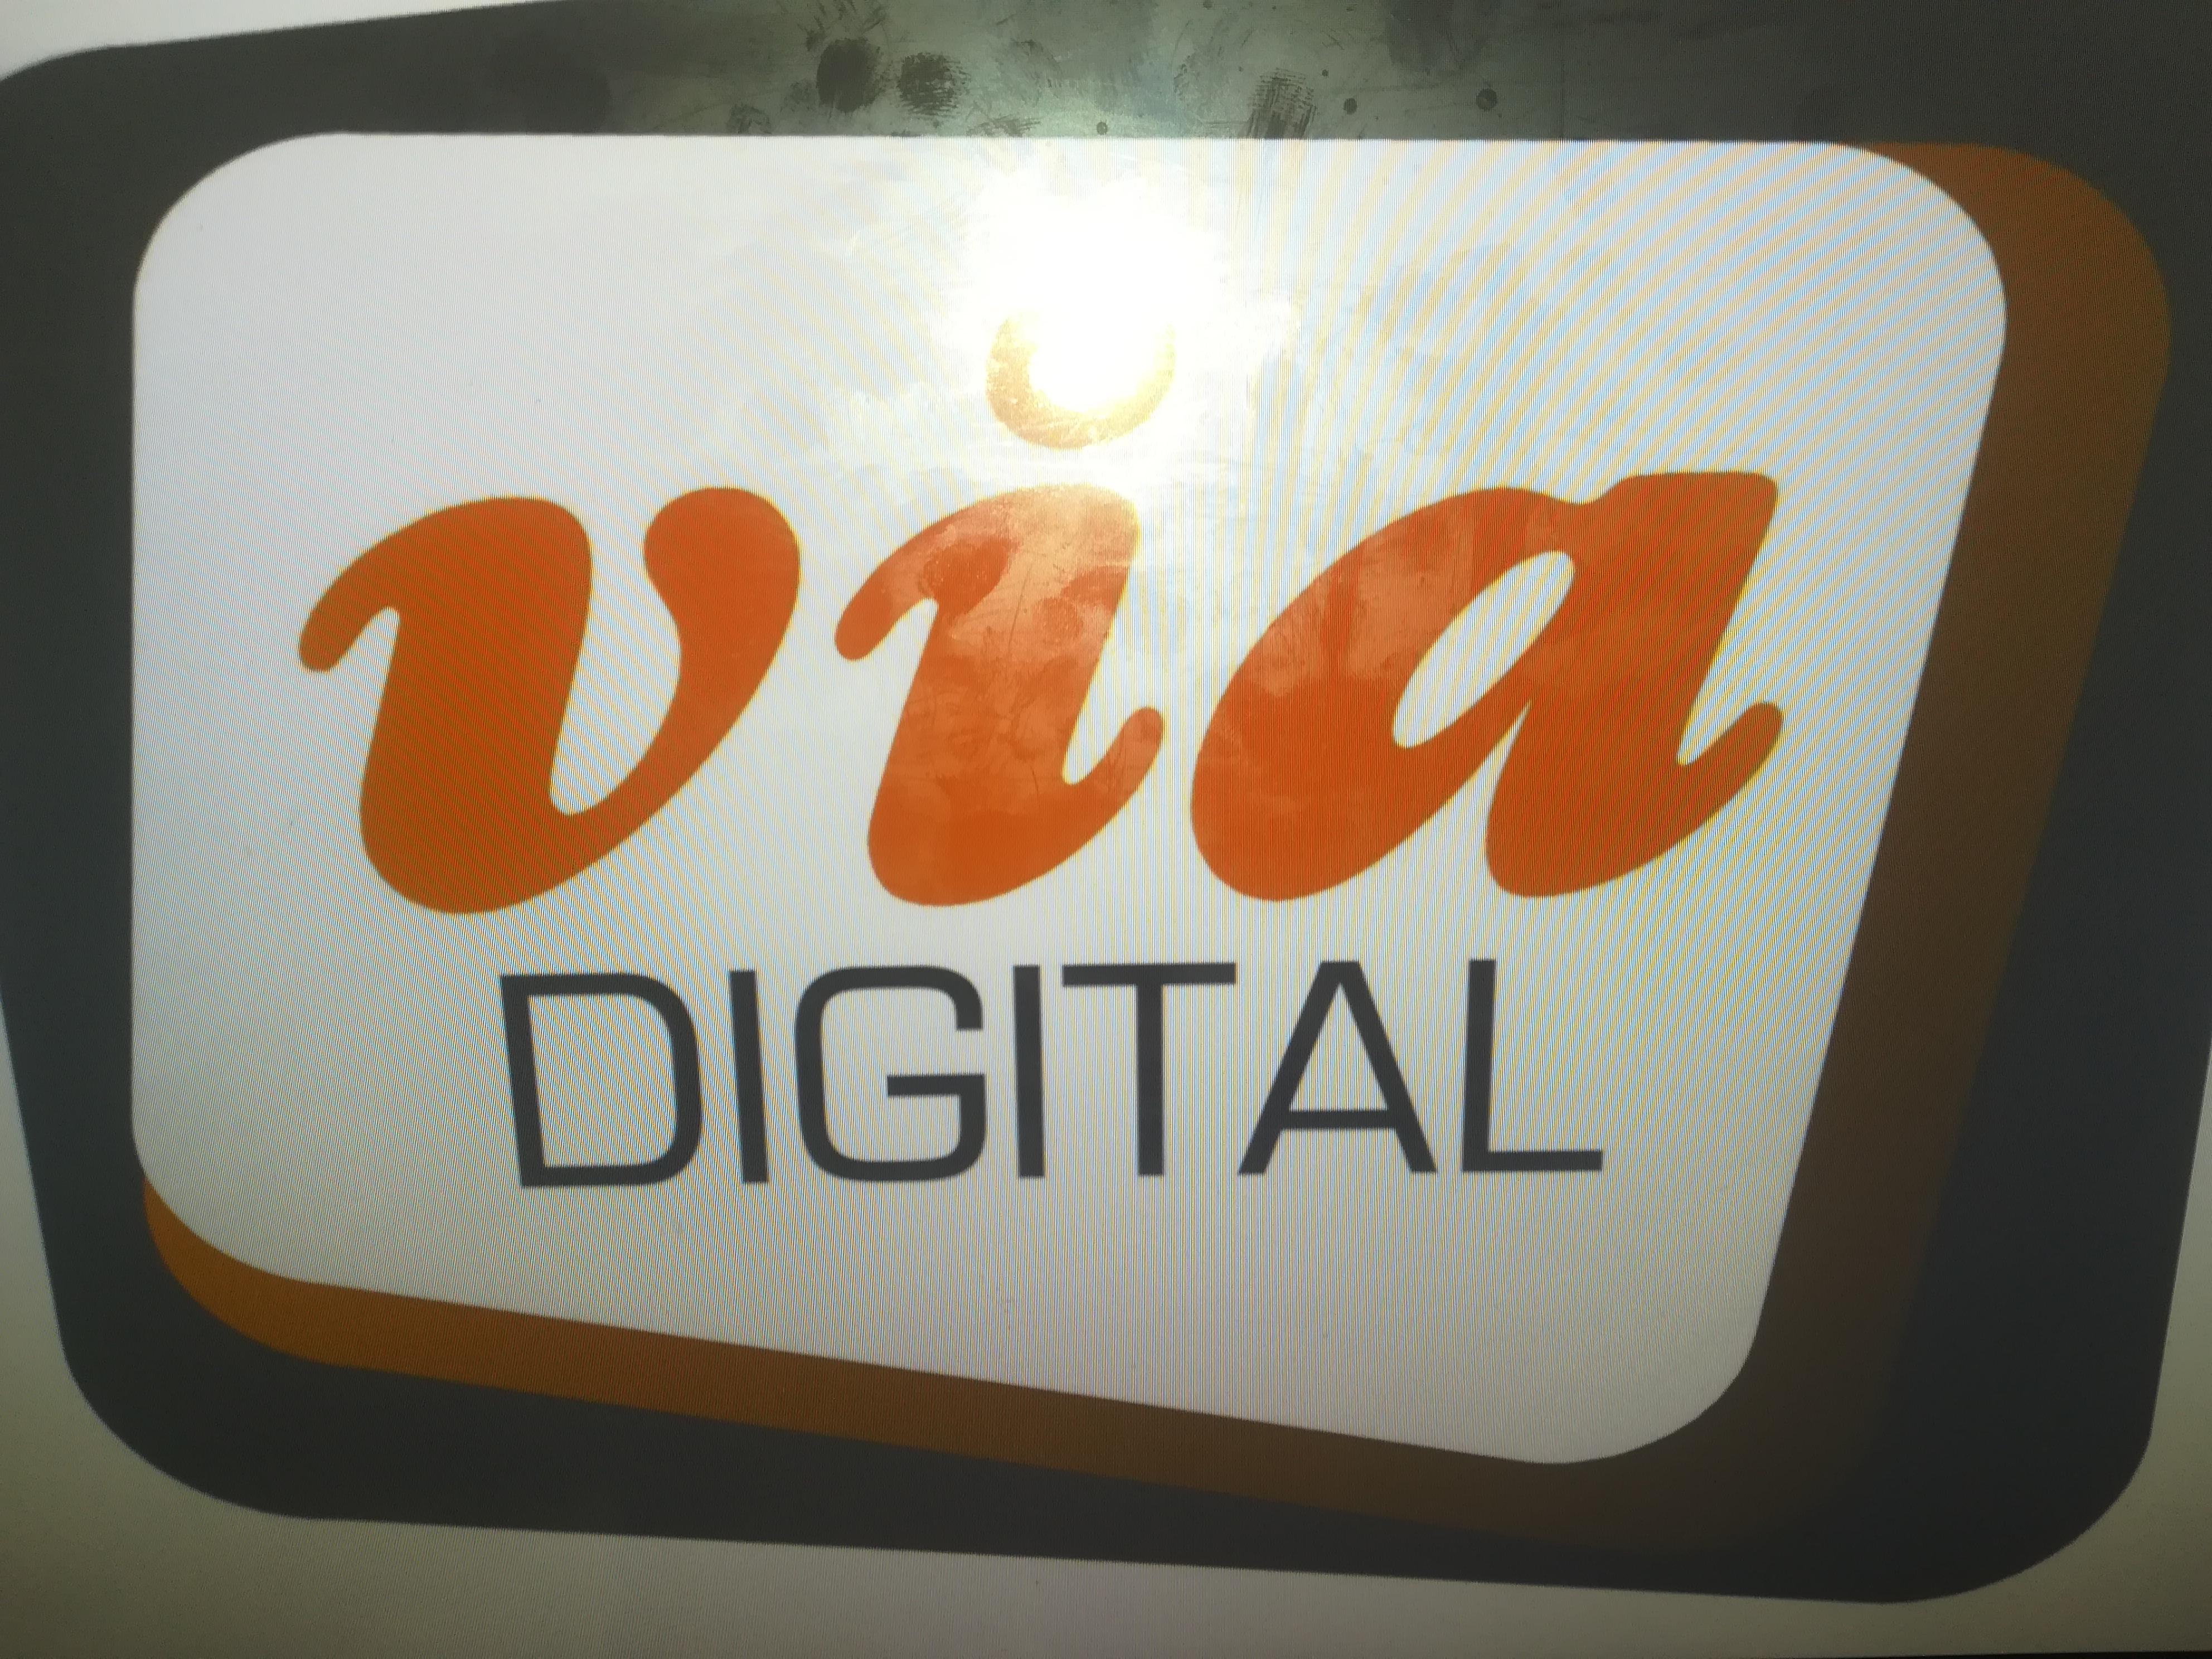 Viadigitalsl